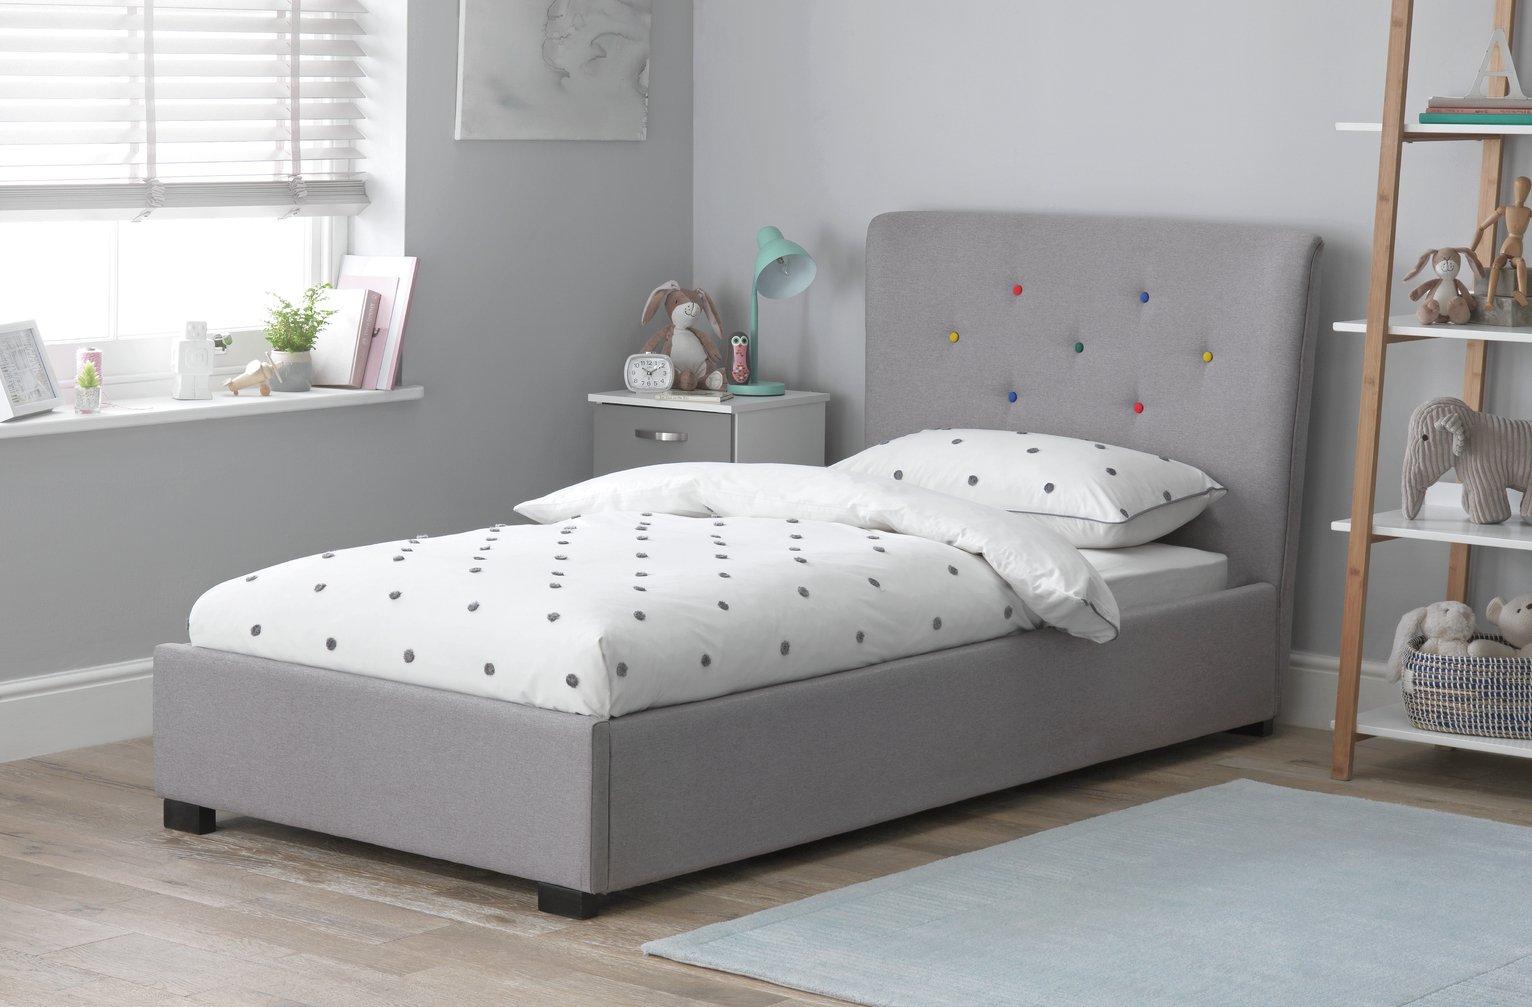 Argos Home Benjamin Bed and Silentnight Mattress - Grey